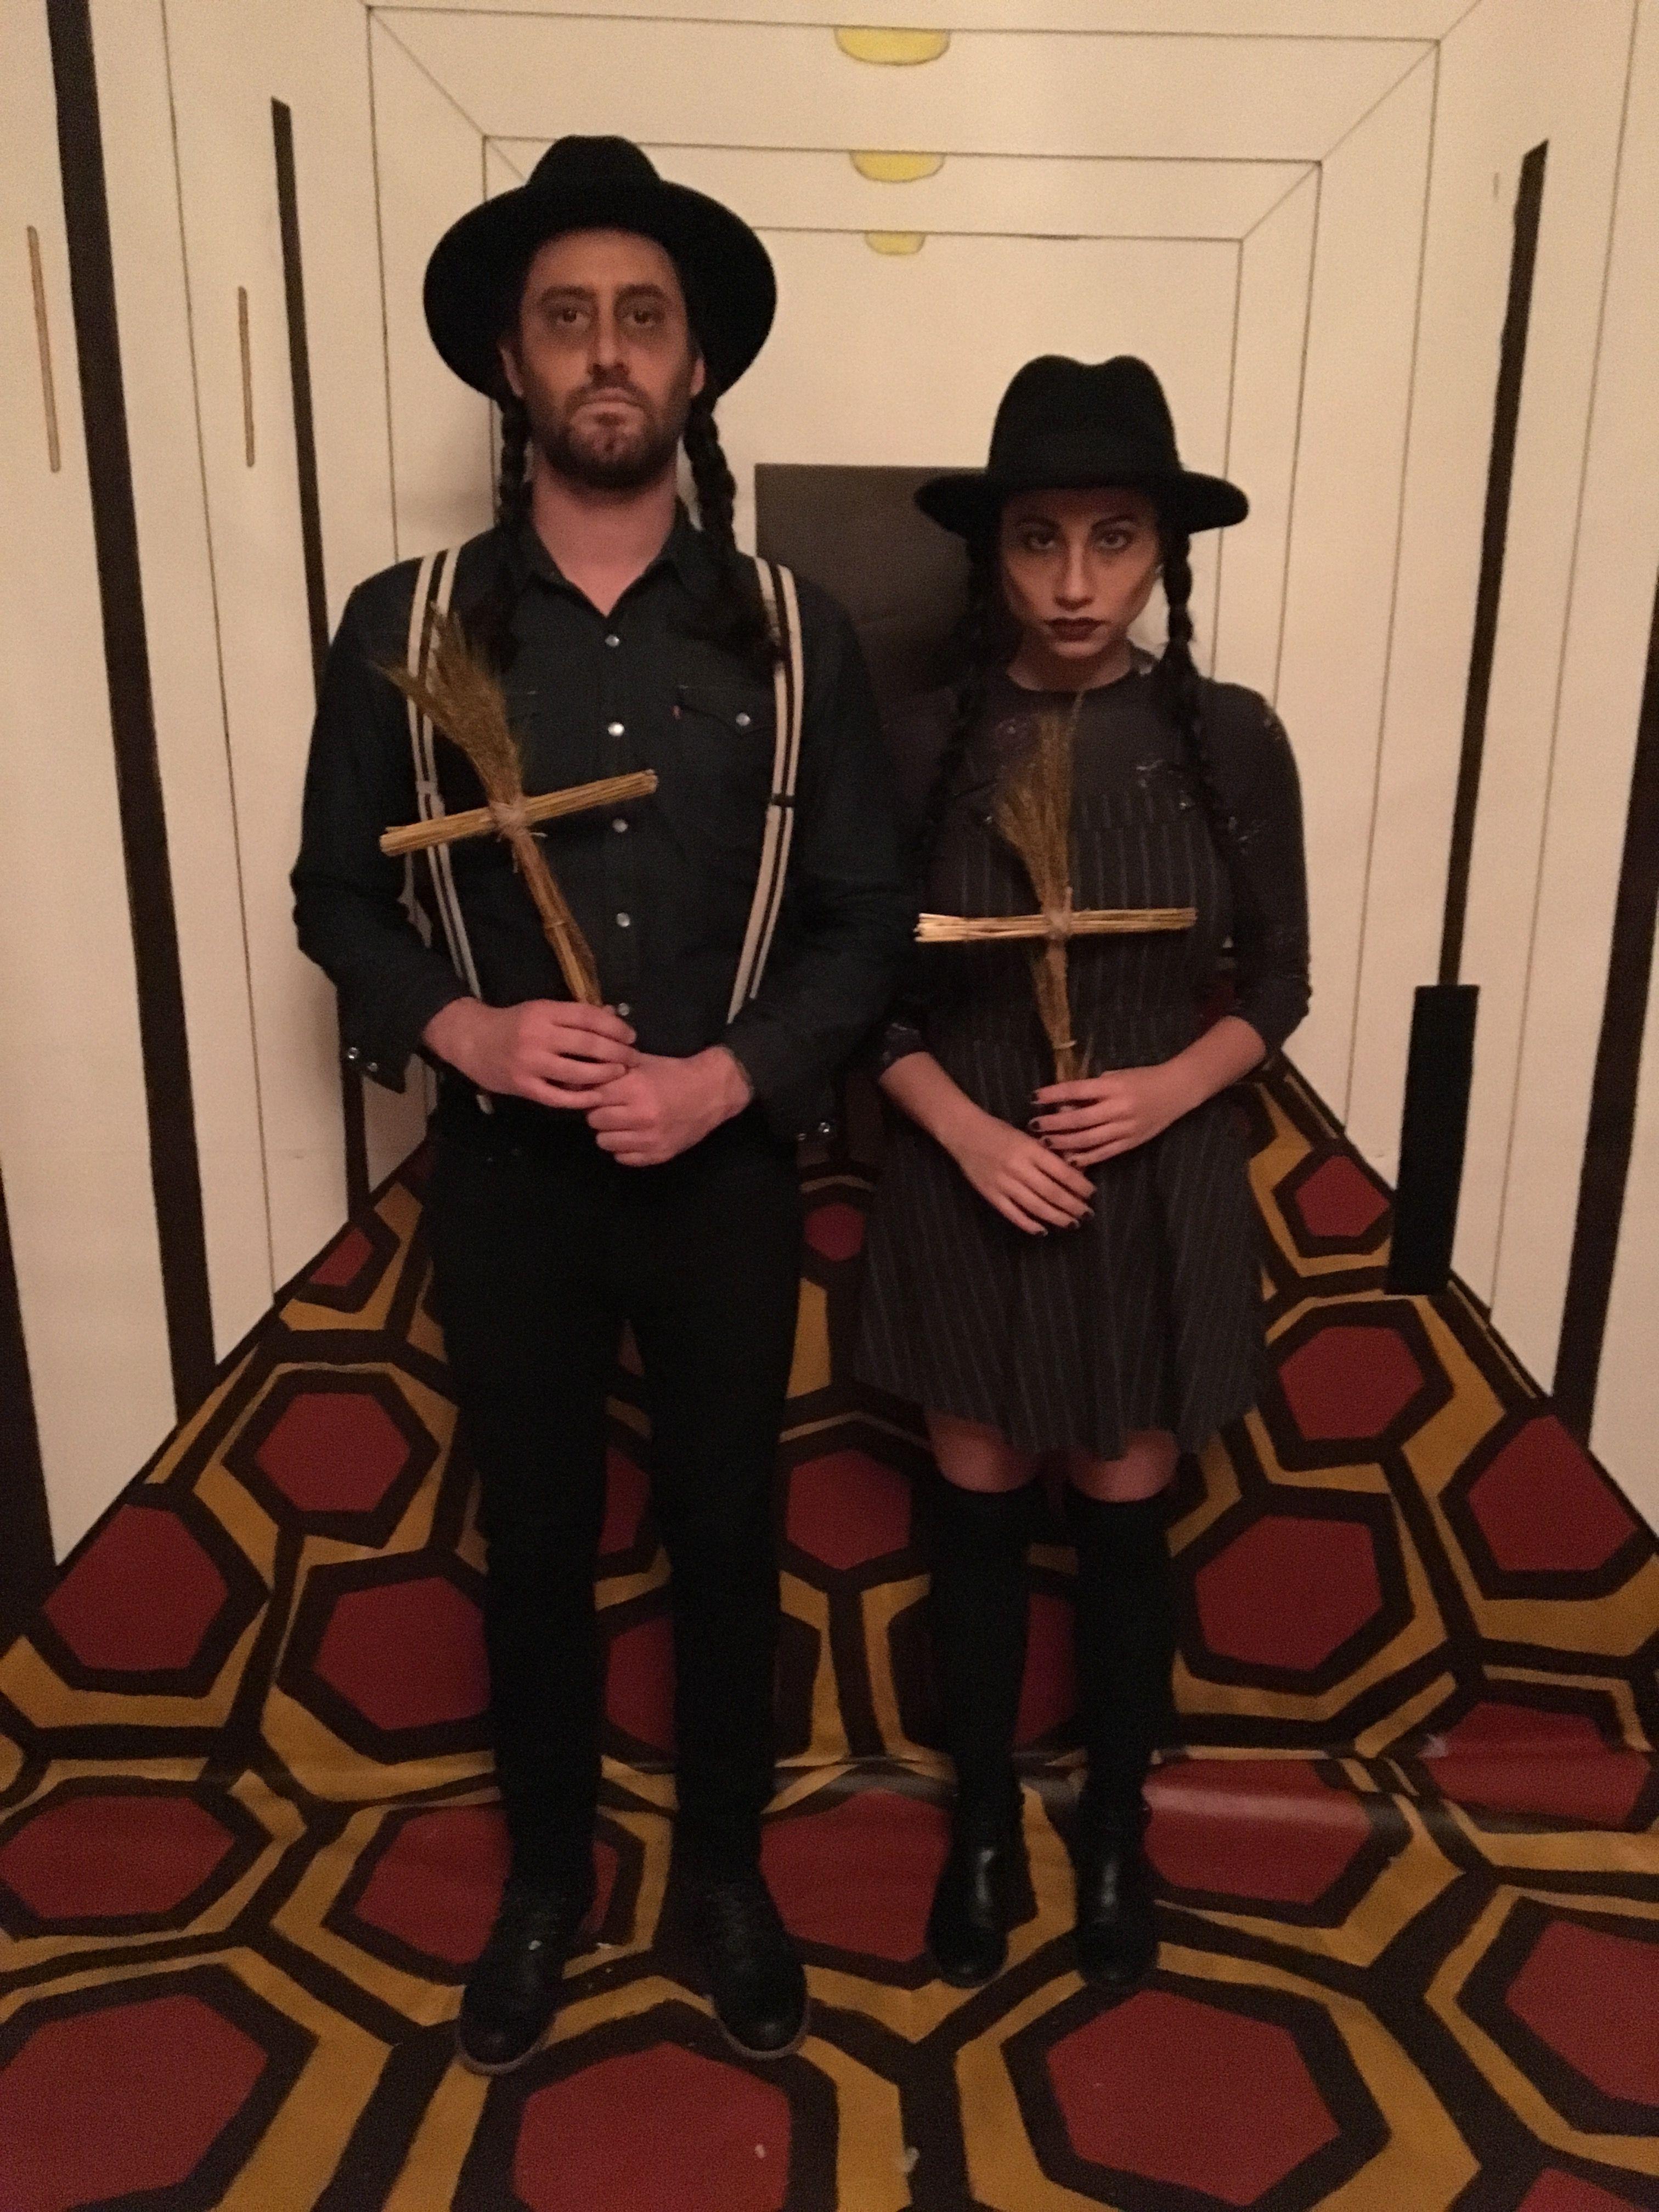 Children of the Corn Couples Halloween Costume Stephen King